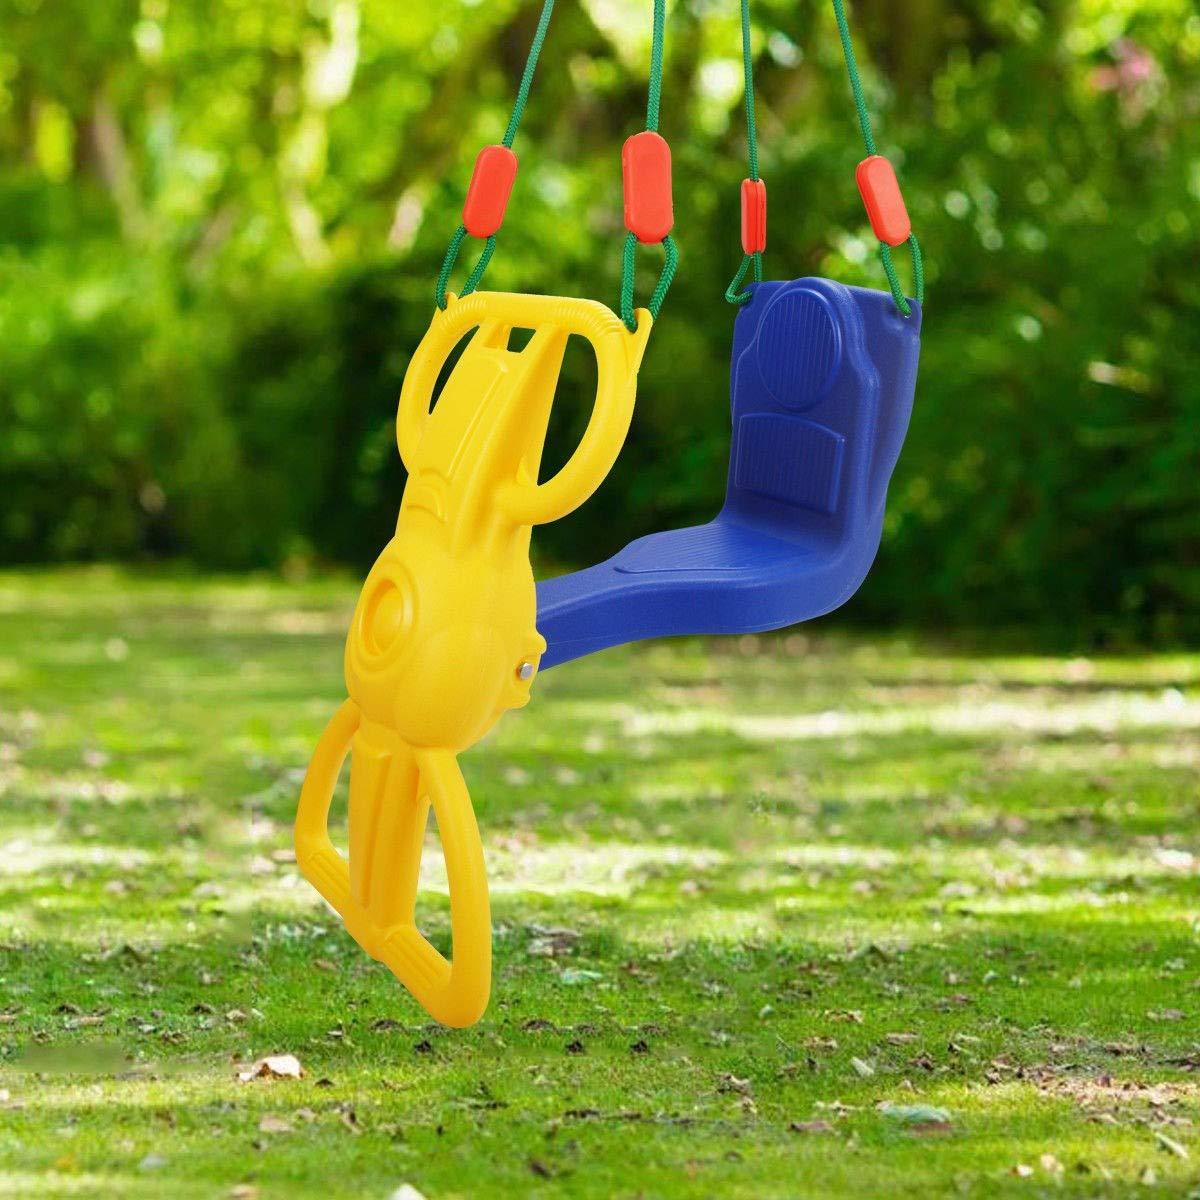 Backyard Kids Rider Glider Swing with Hangers by Apontus (Image #3)